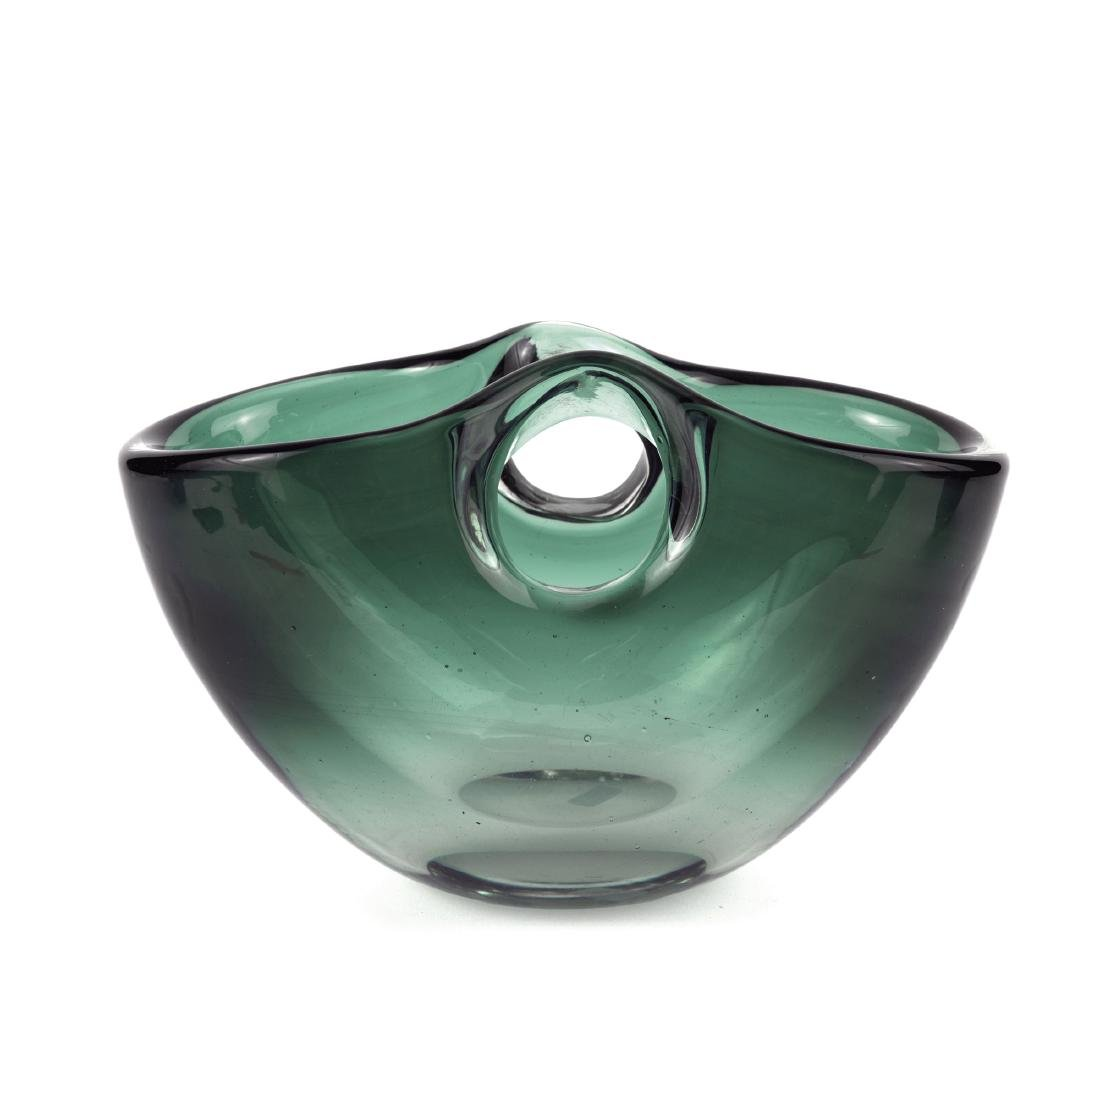 Bowl, 1953